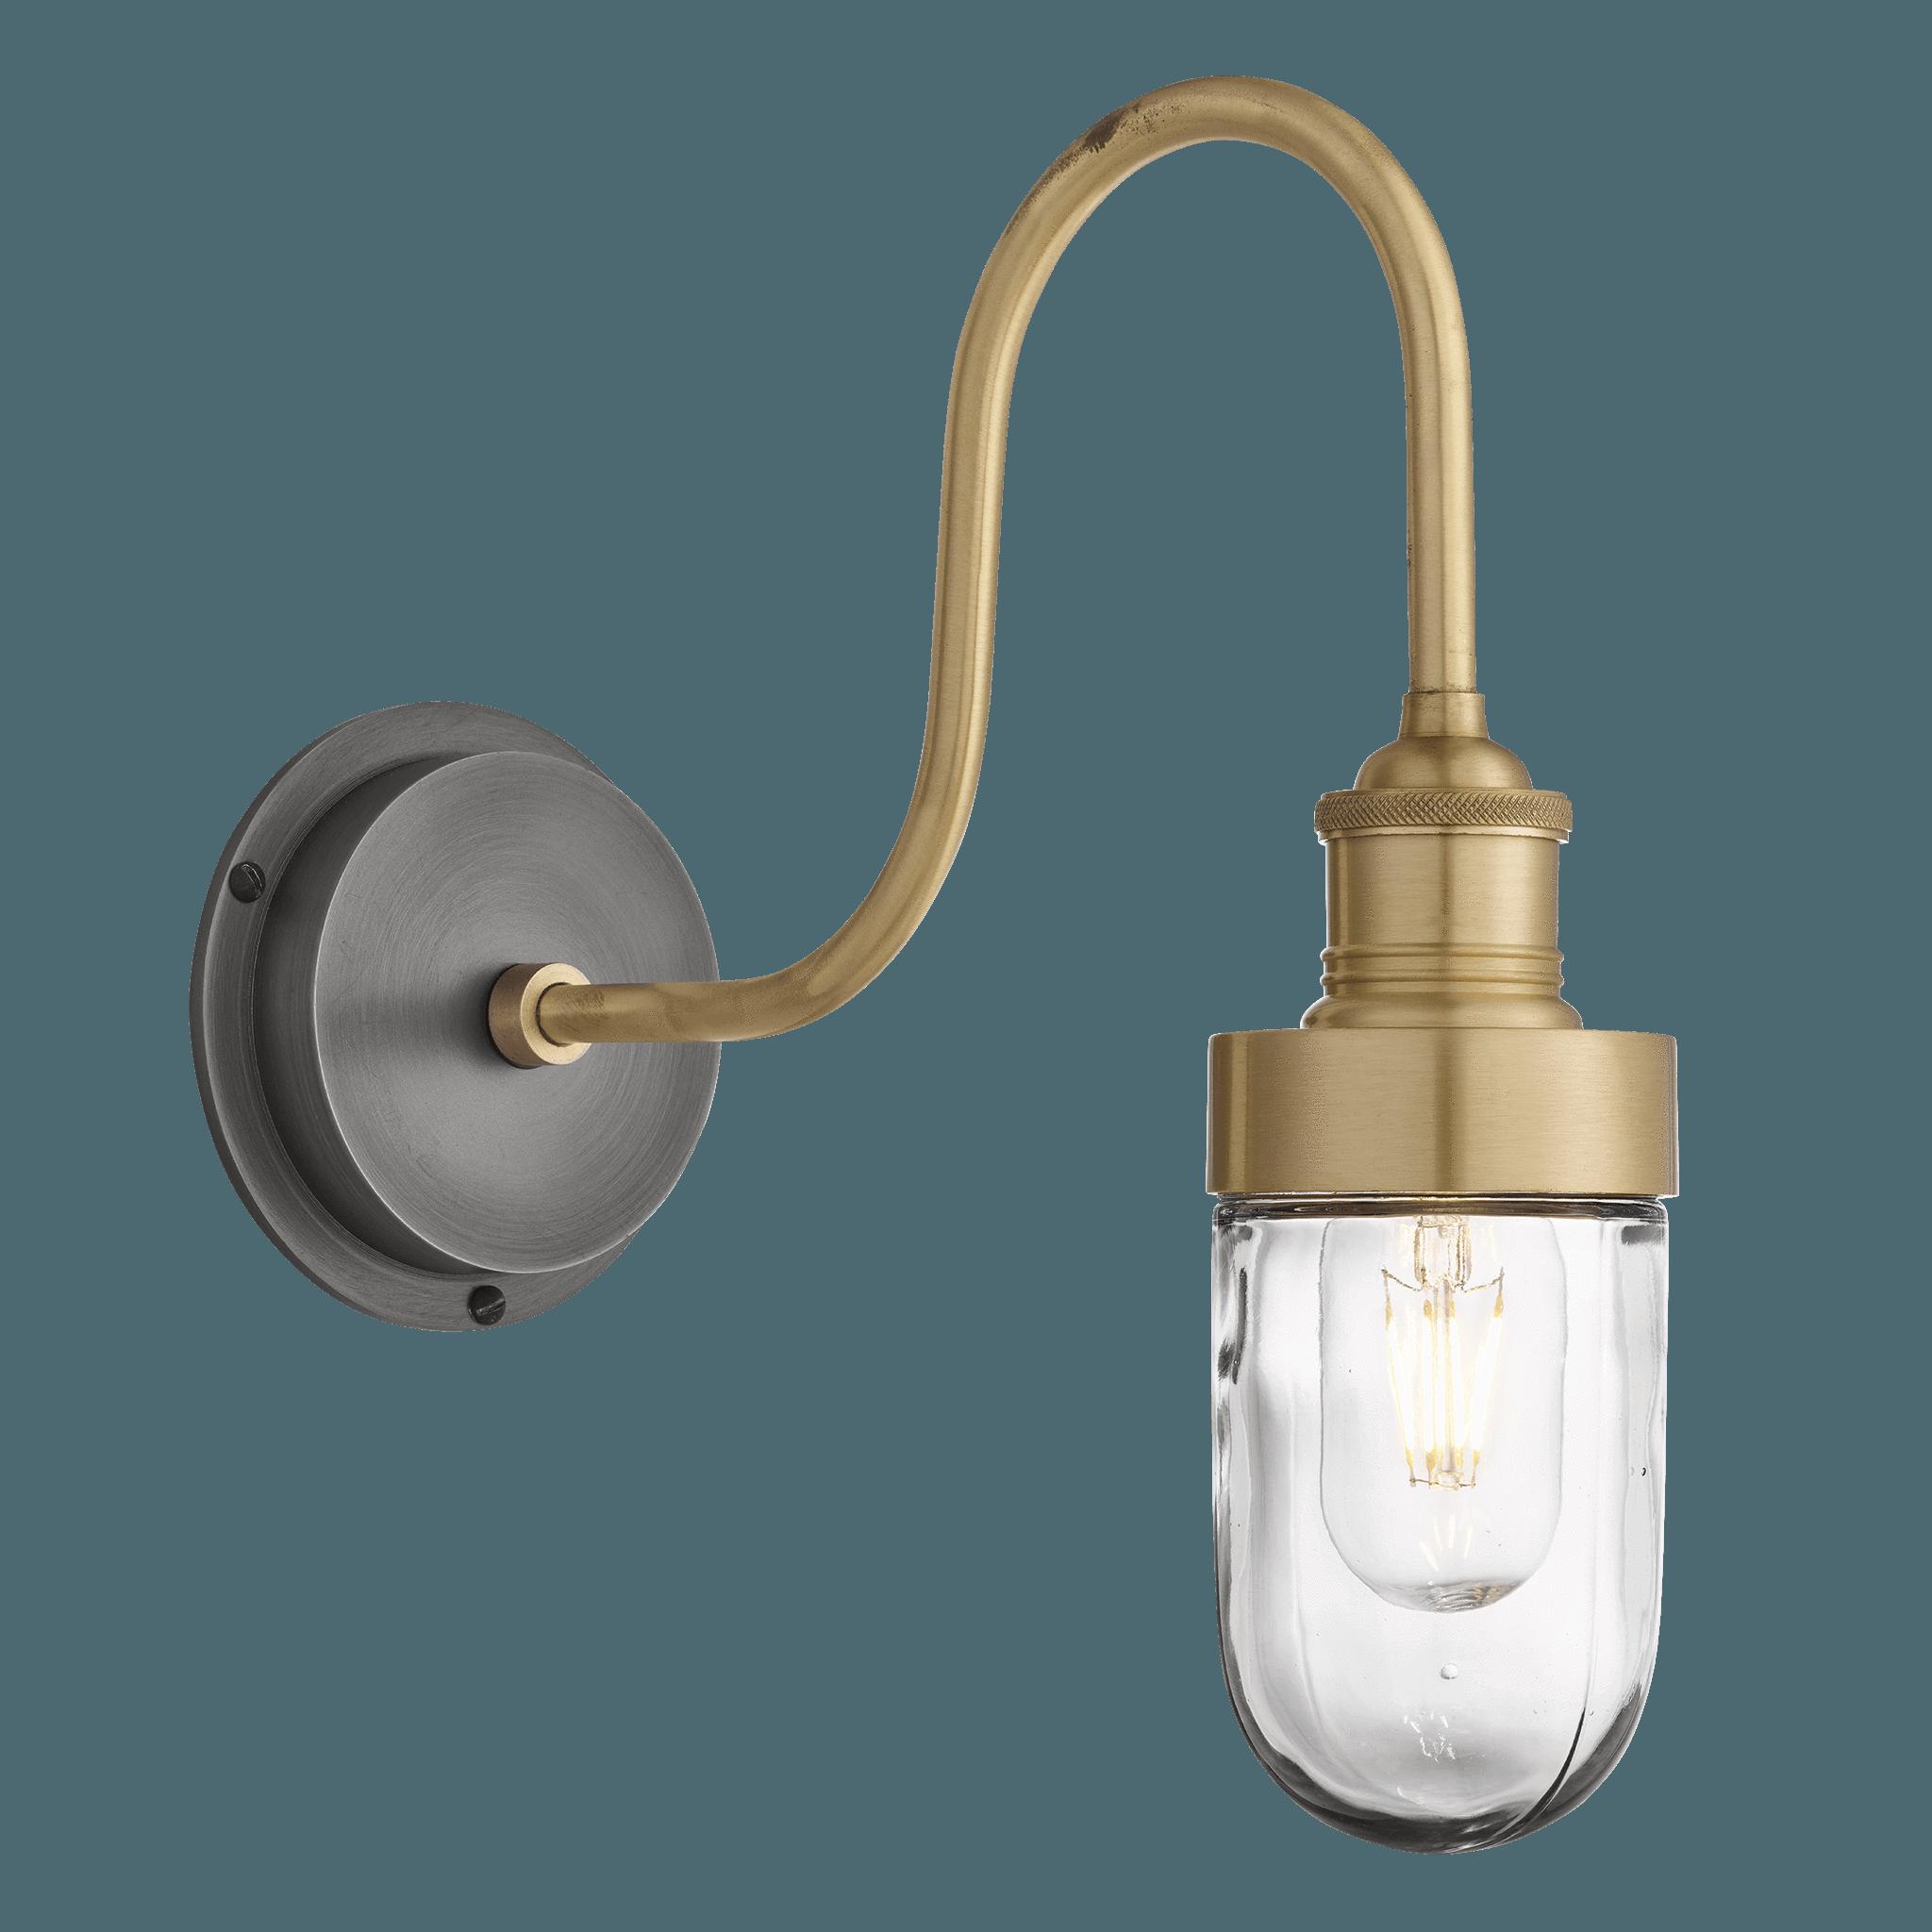 Swan Neck Outdoor Bathroom Wall Light Brass Tube Glass In